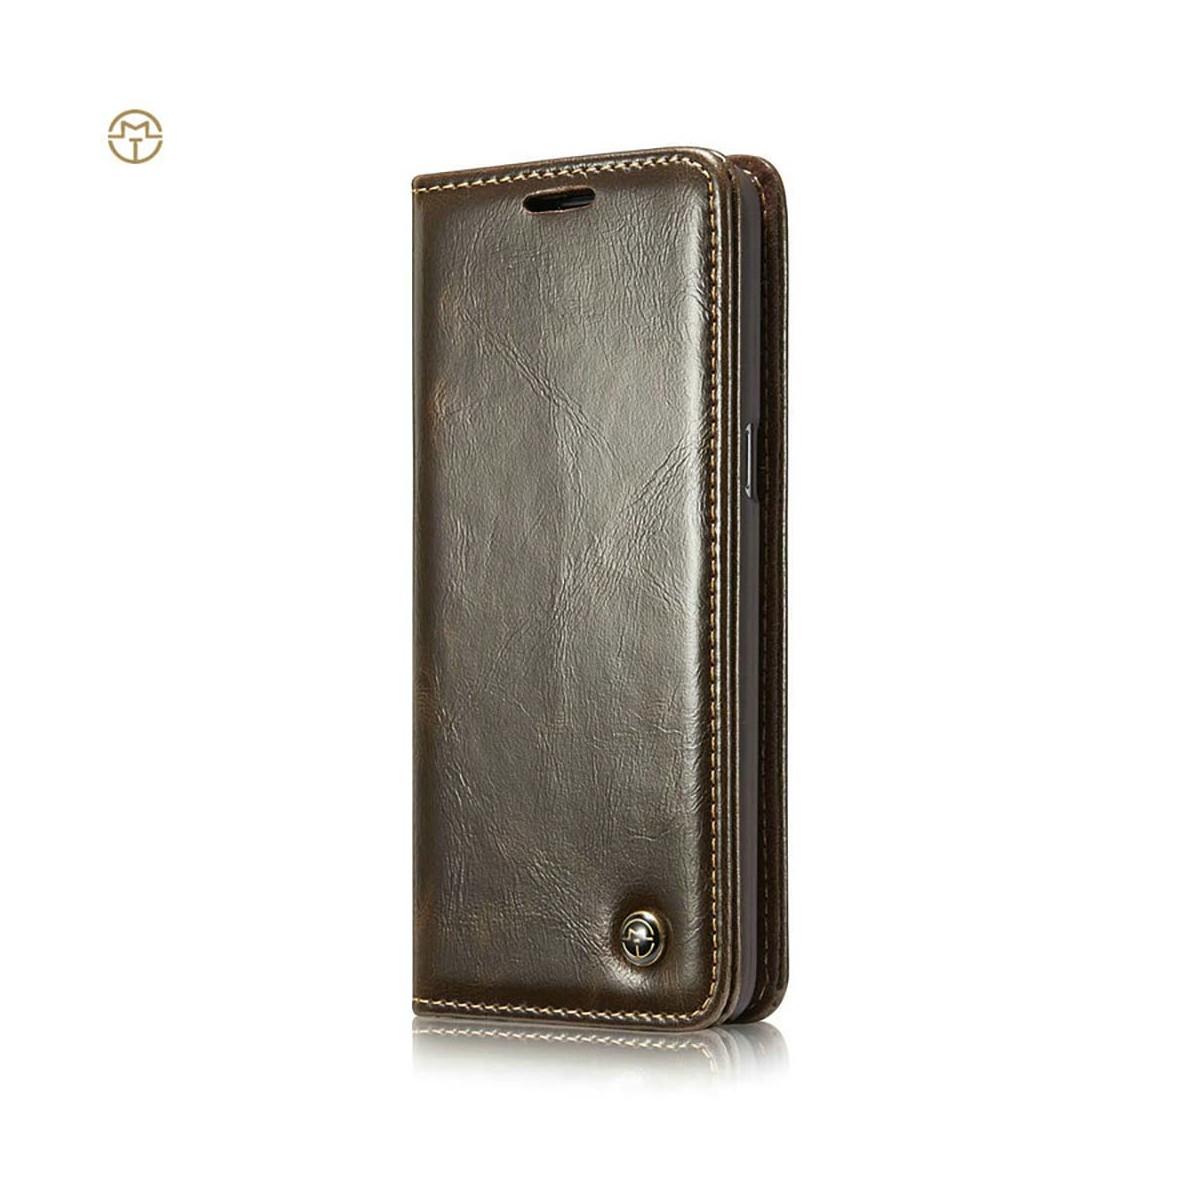 Etui Galaxy S8 Porte cartes Marron - CaseMe